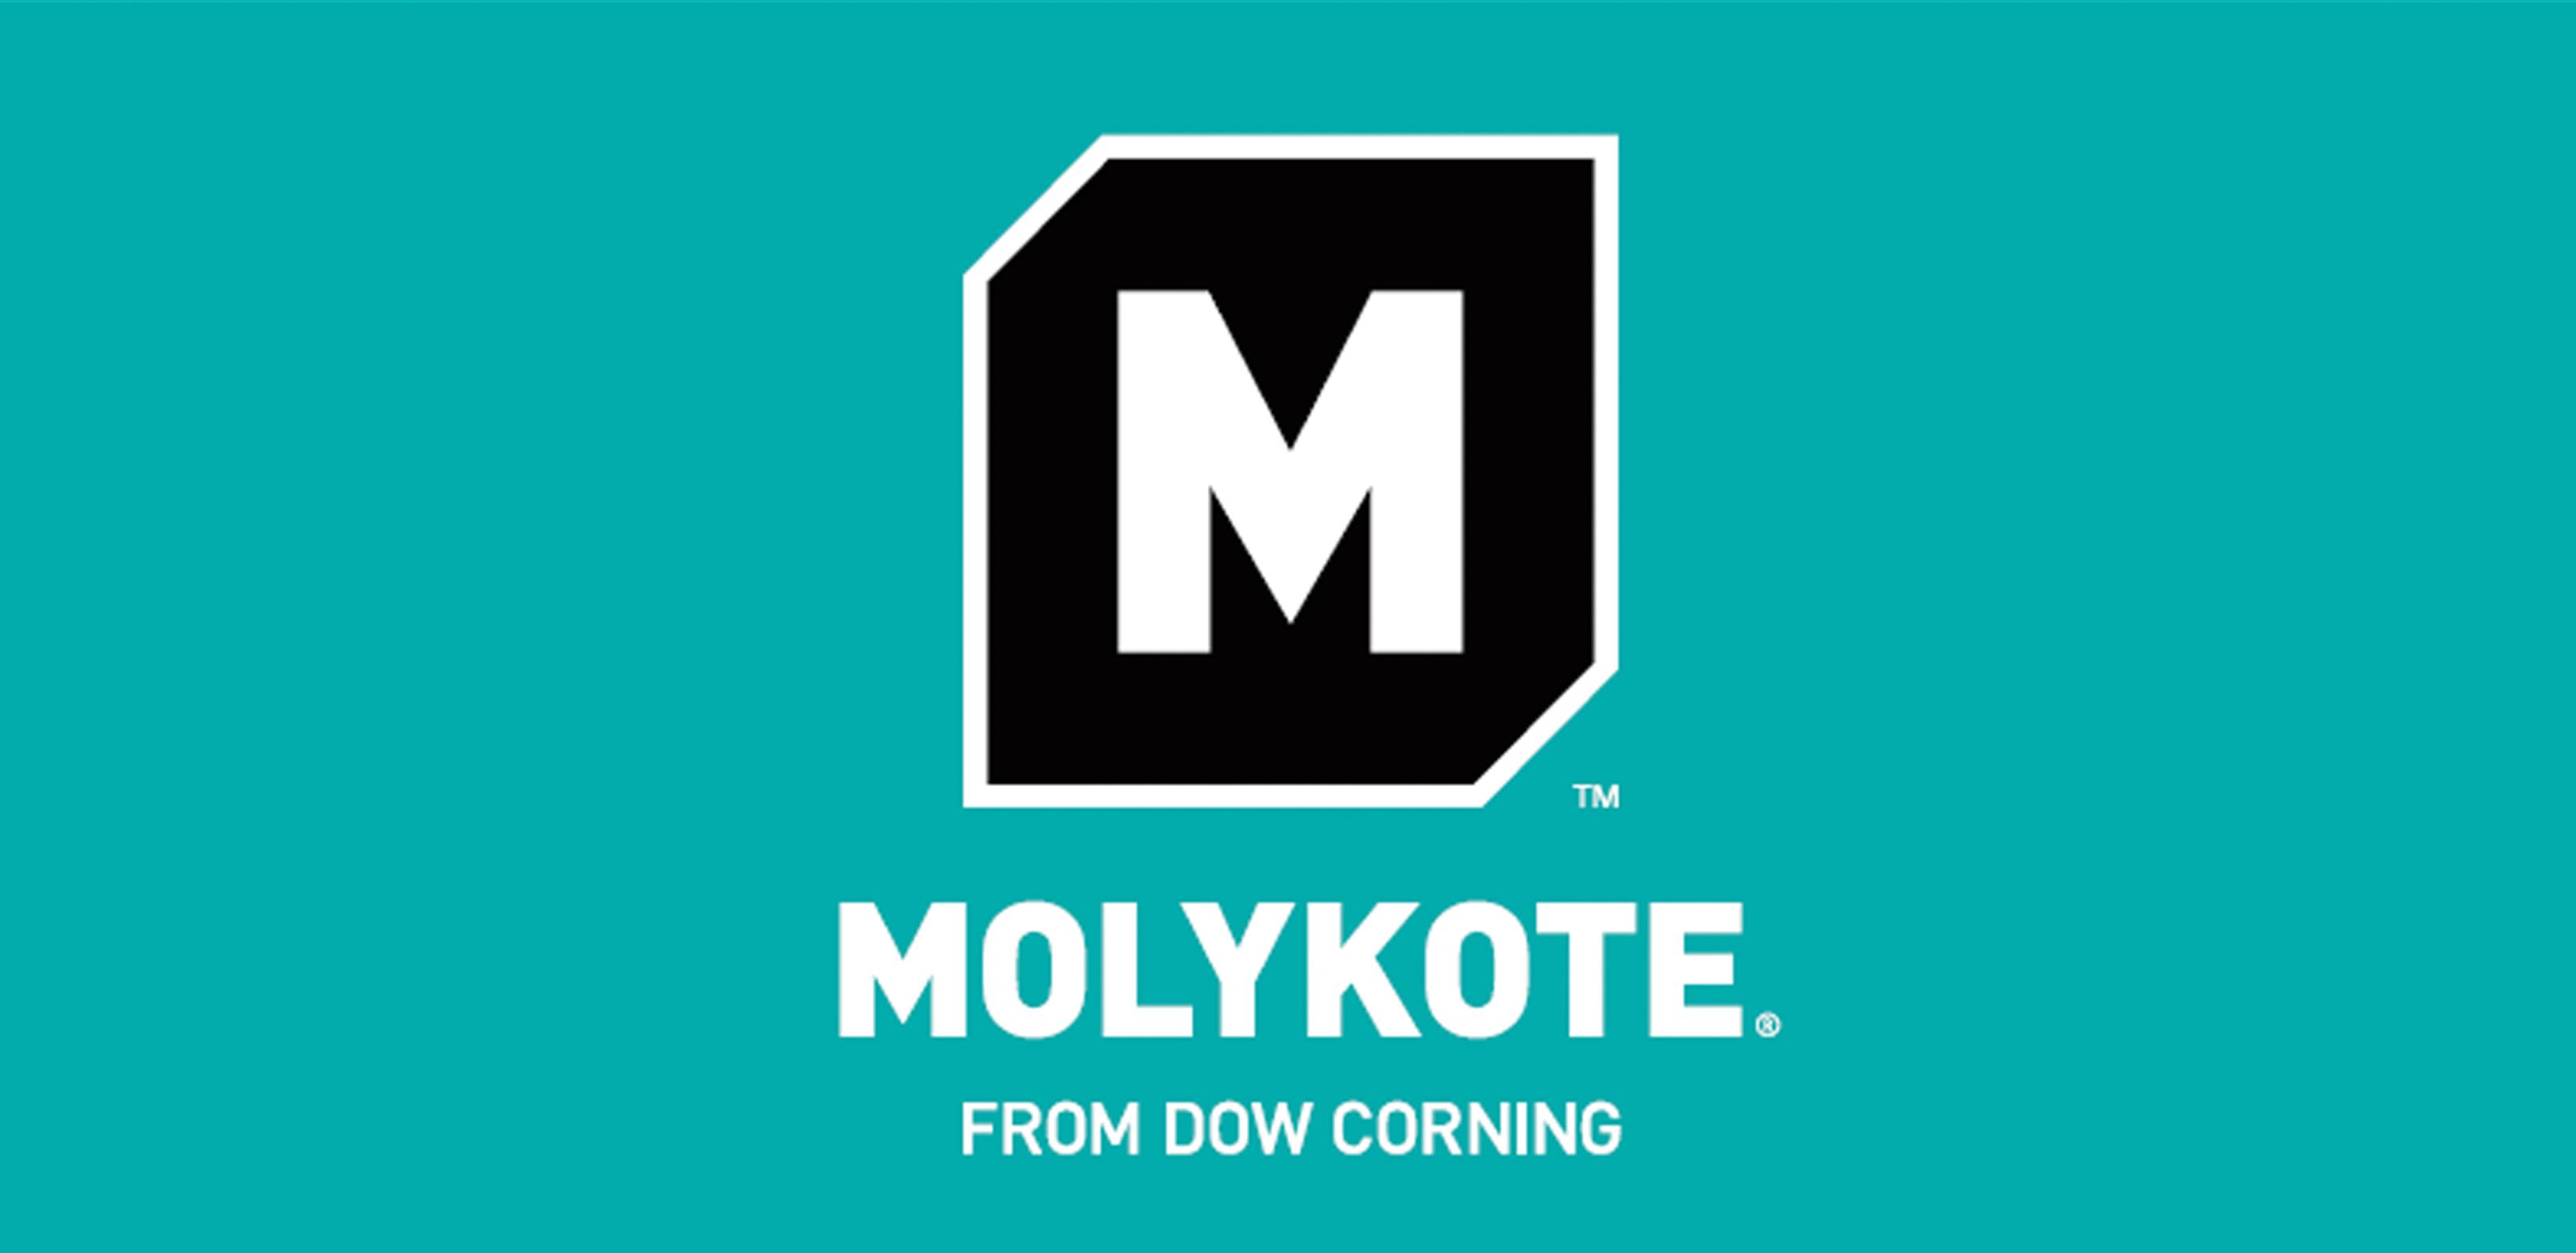 Molykote Lubricants Molykote G N Plus Grease